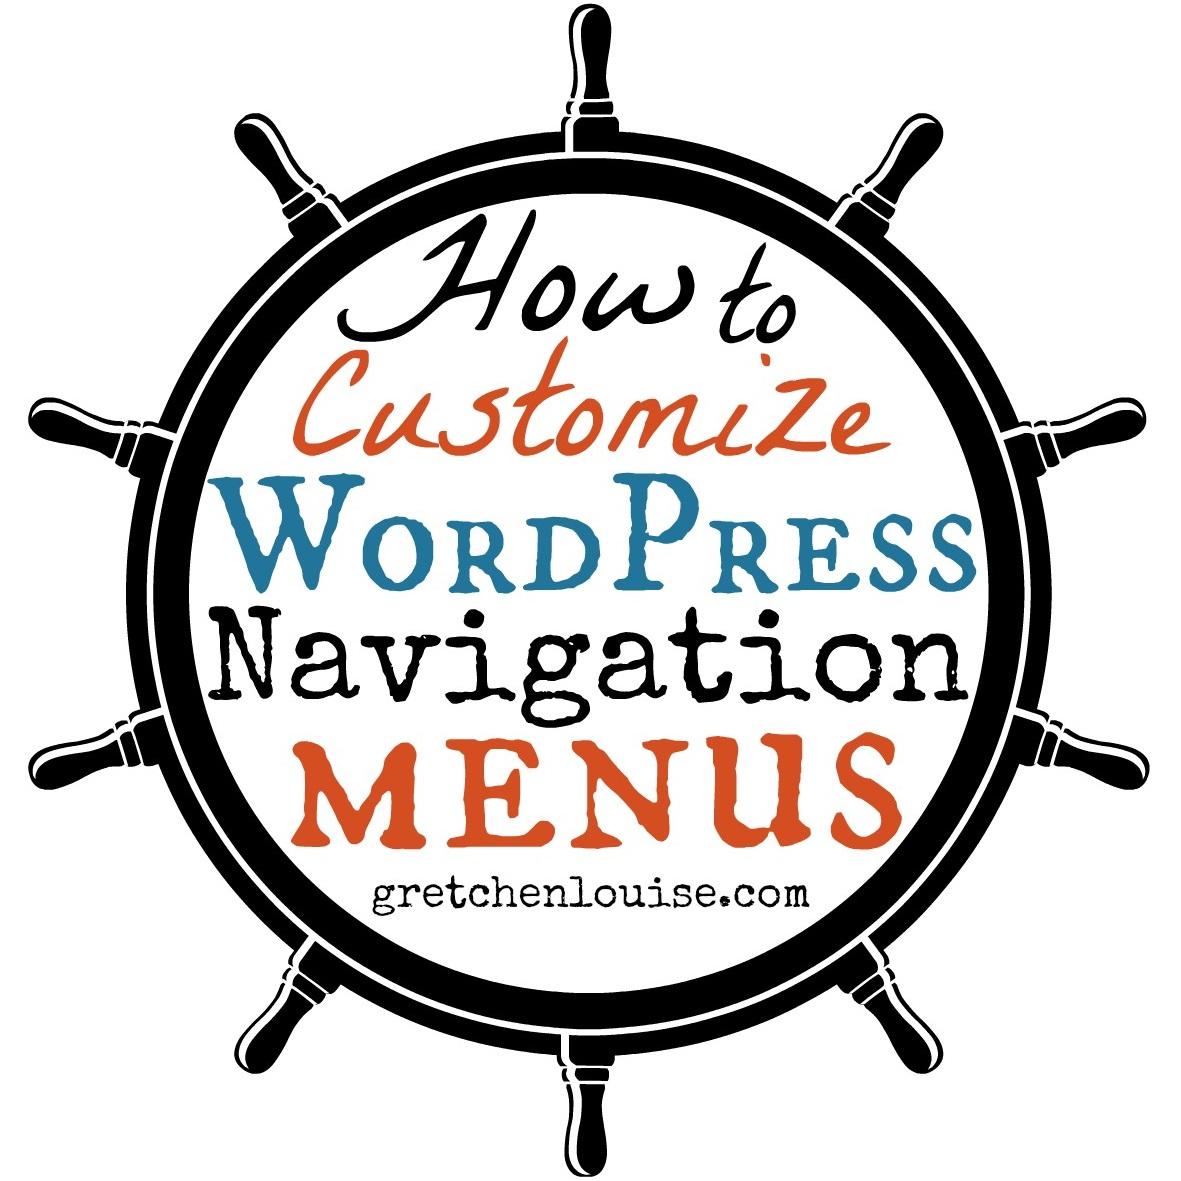 How to Customize WordPress Navigation Menus